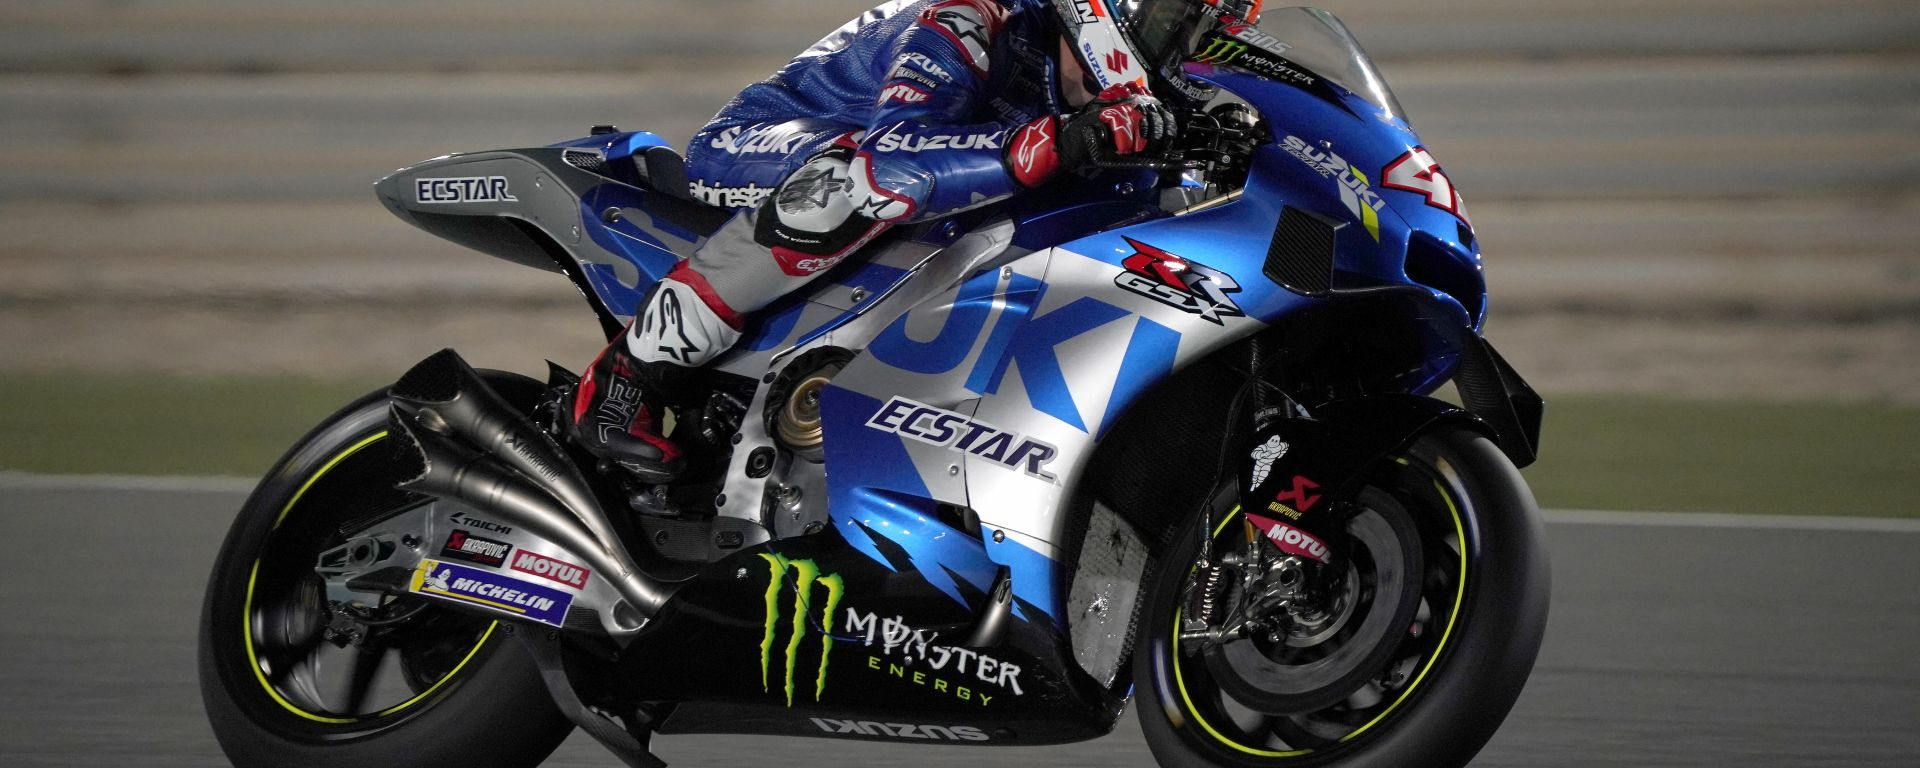 Quanti CV ha la Suzuki GSX-RR da MotoGP?